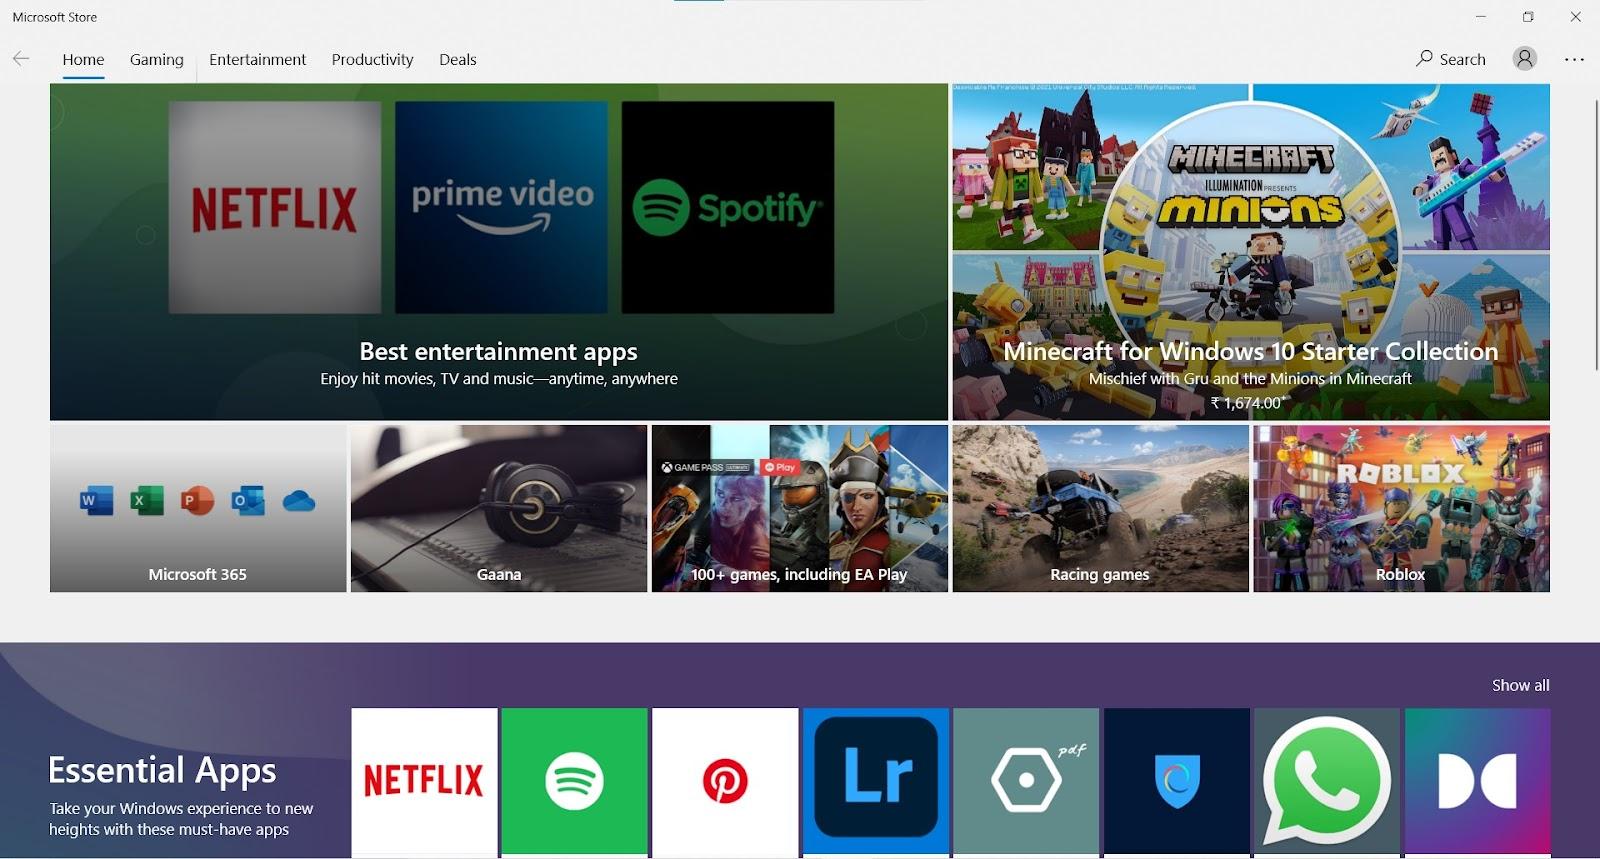 Microsoft Store window